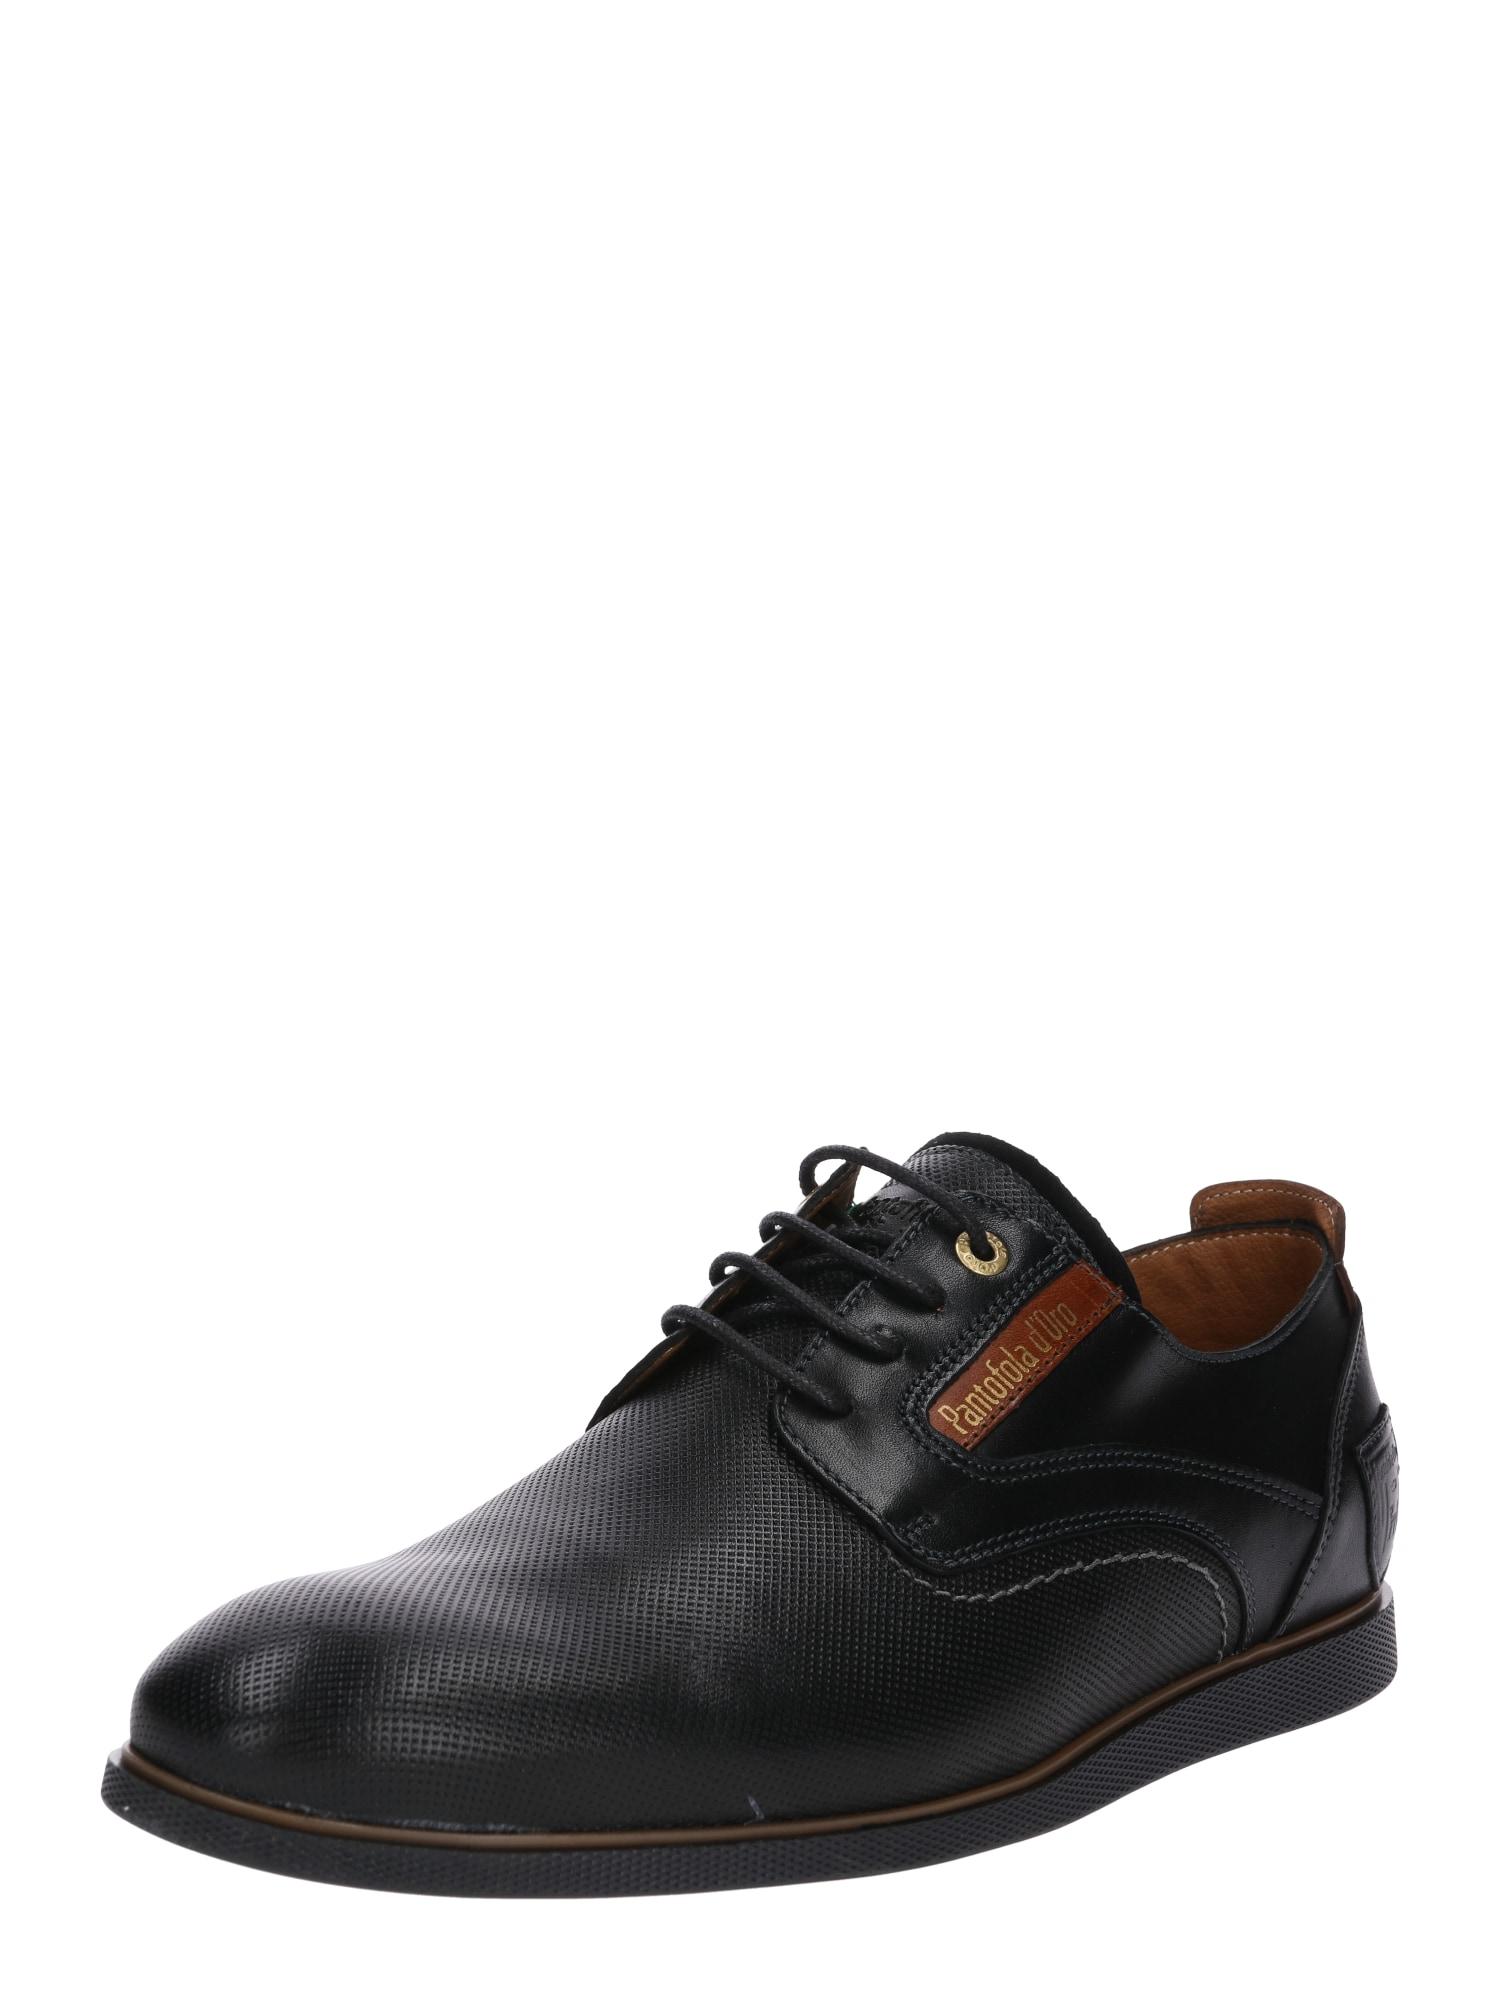 PANTOFOLA DORO Šněrovací boty Urbino černá PANTOFOLA D'ORO